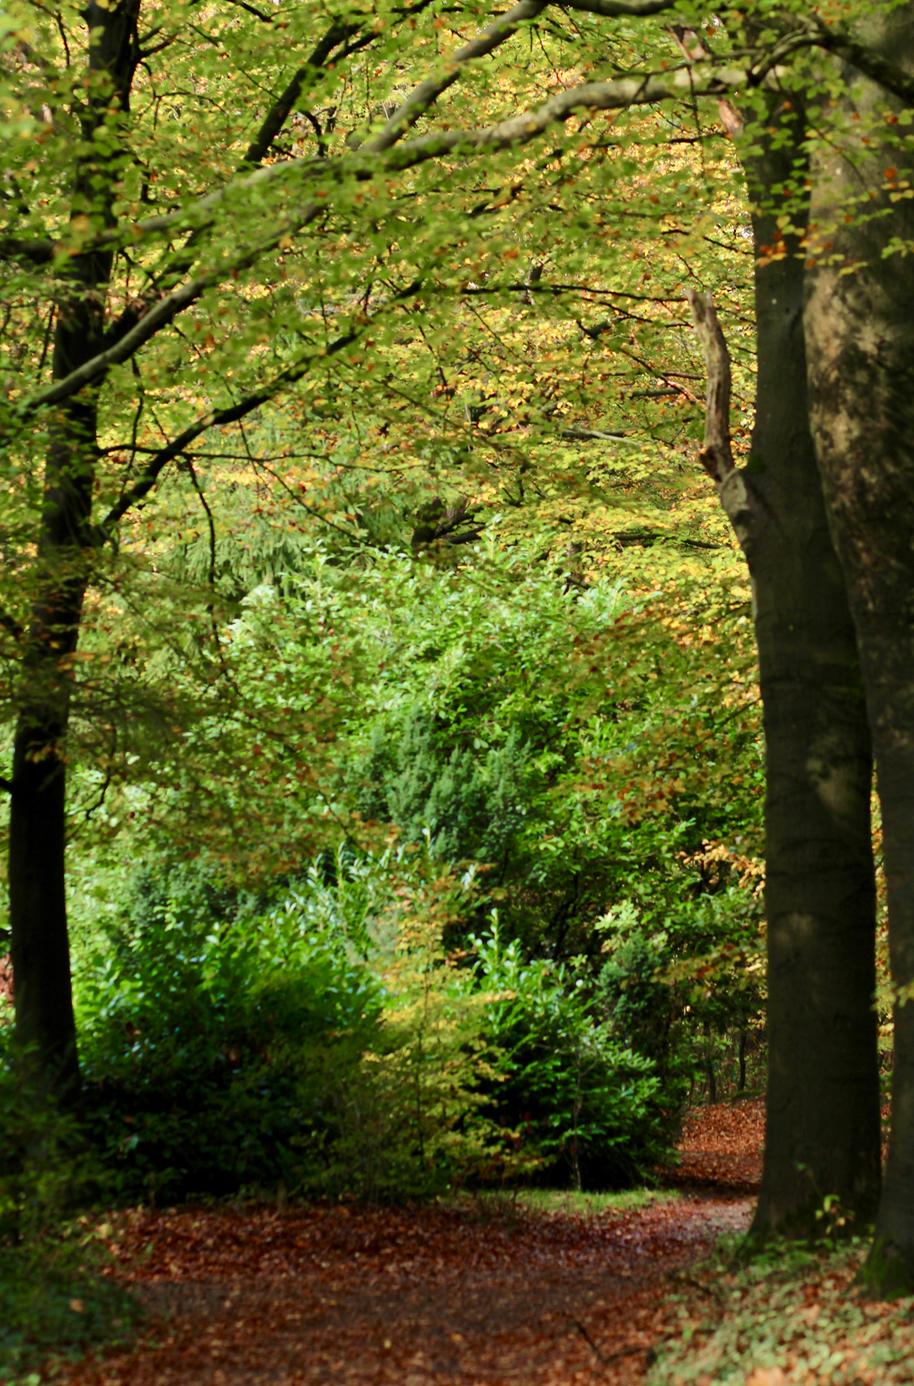 camping rcn het grote bos.png